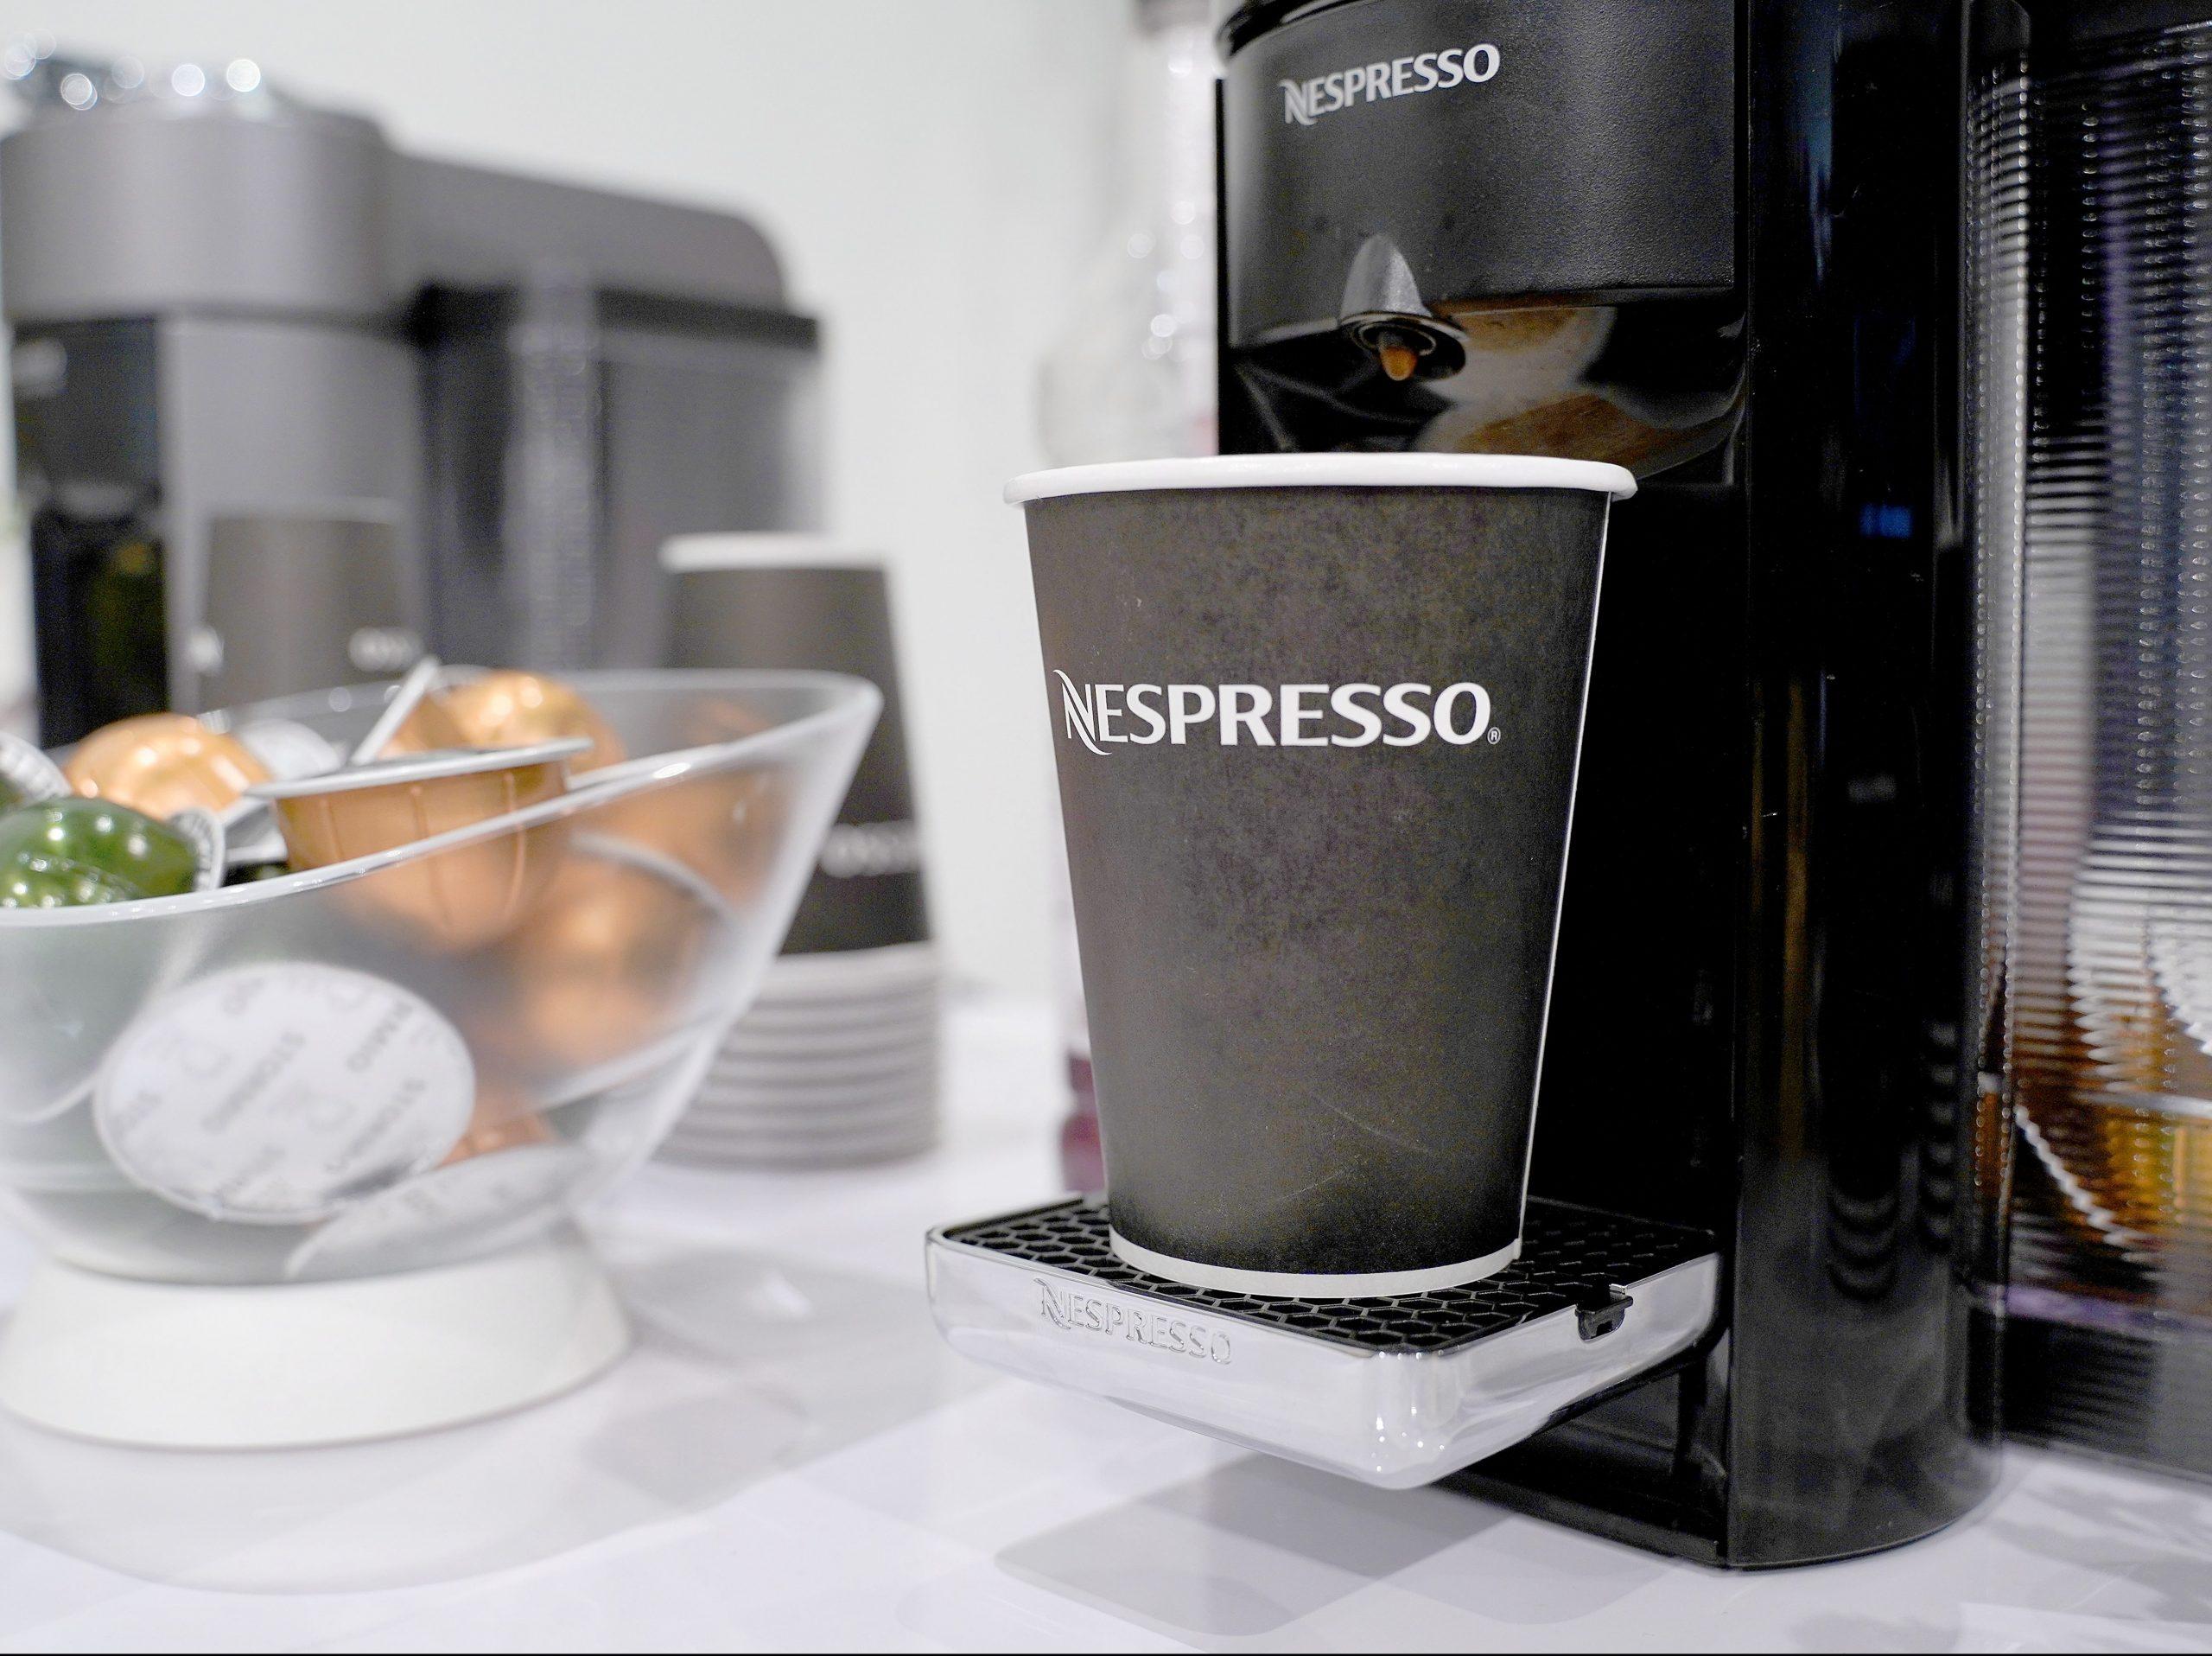 Nespresso Finds Child Labour At Three Guatemalan Coffee Farms photo